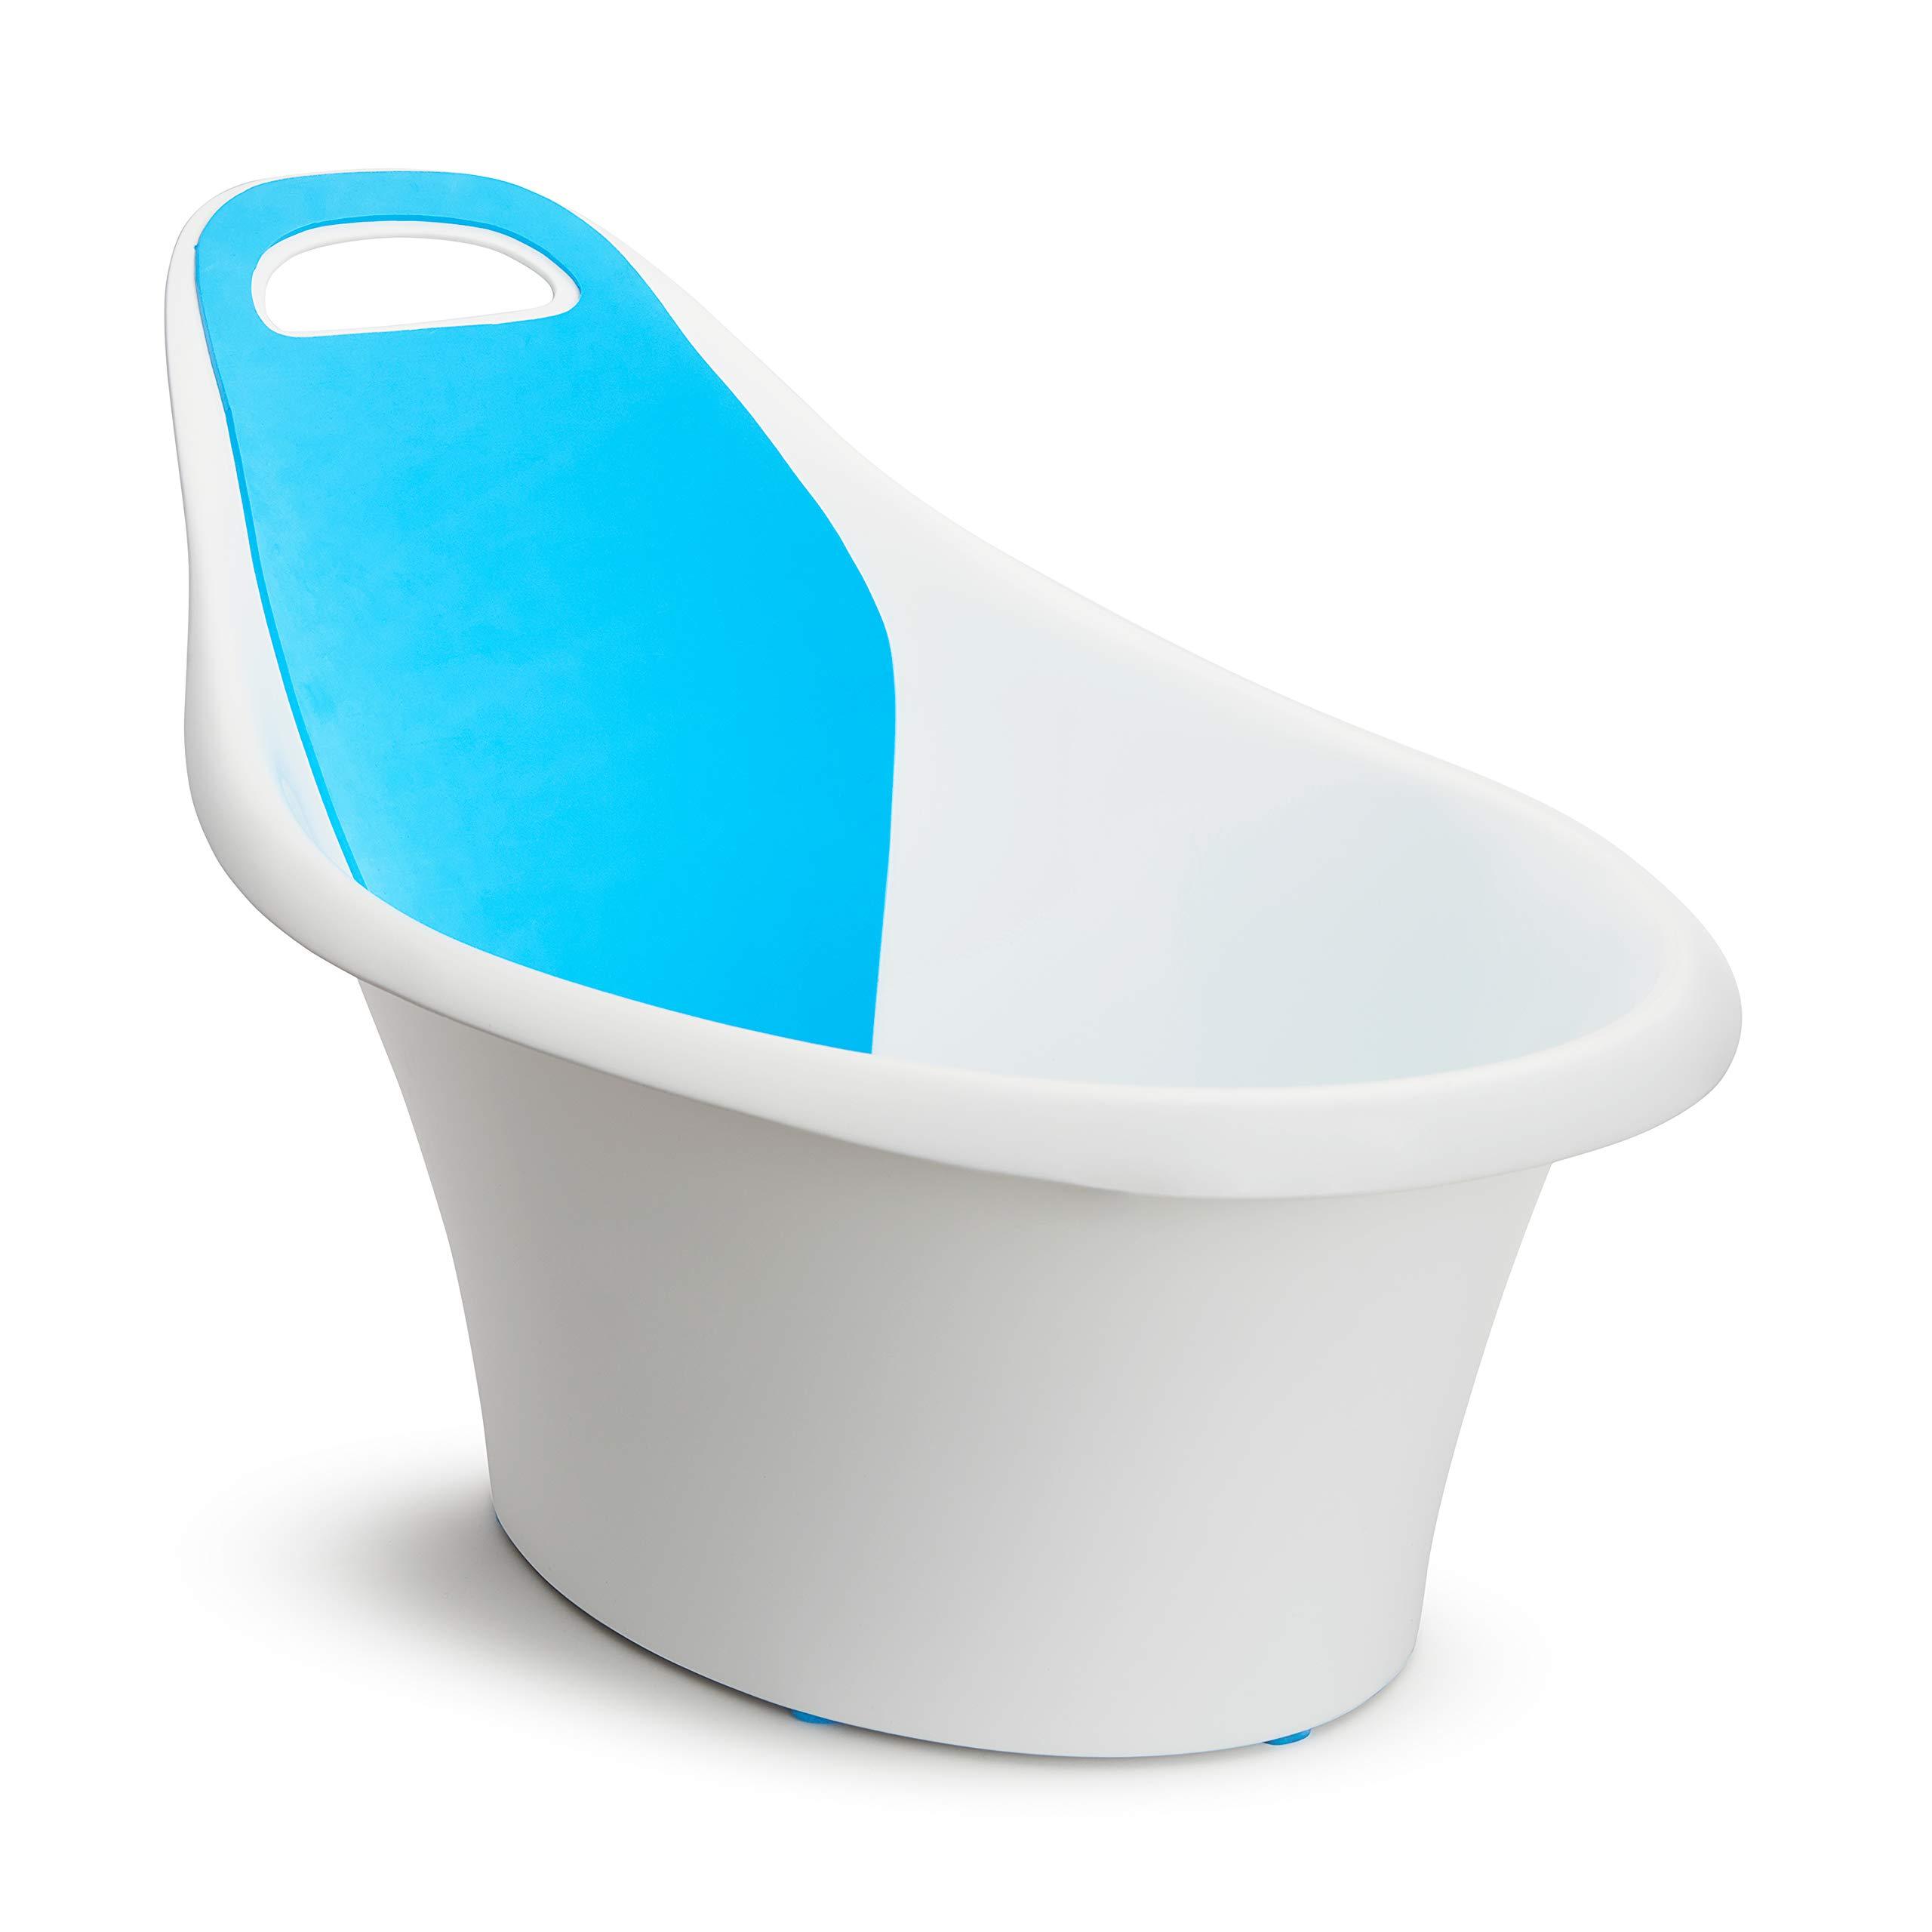 Munchkin Sit and Soak Baby Bath Hard Tub, White, 0-12 Months